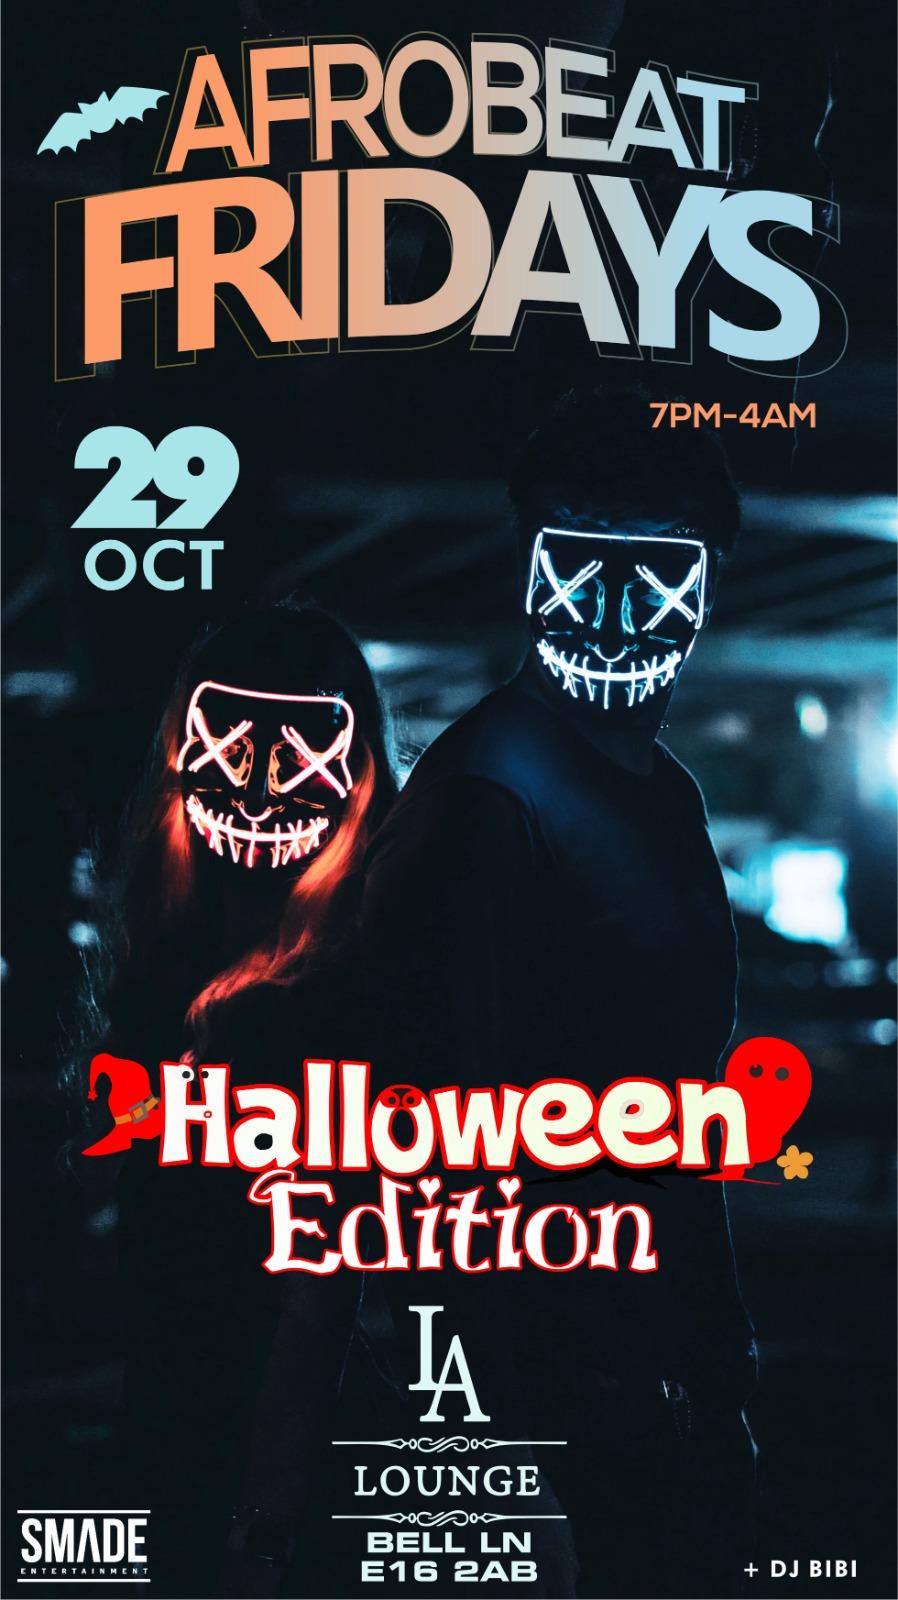 AfroBeat Fridays OCT 29 #HalloweenSpecial